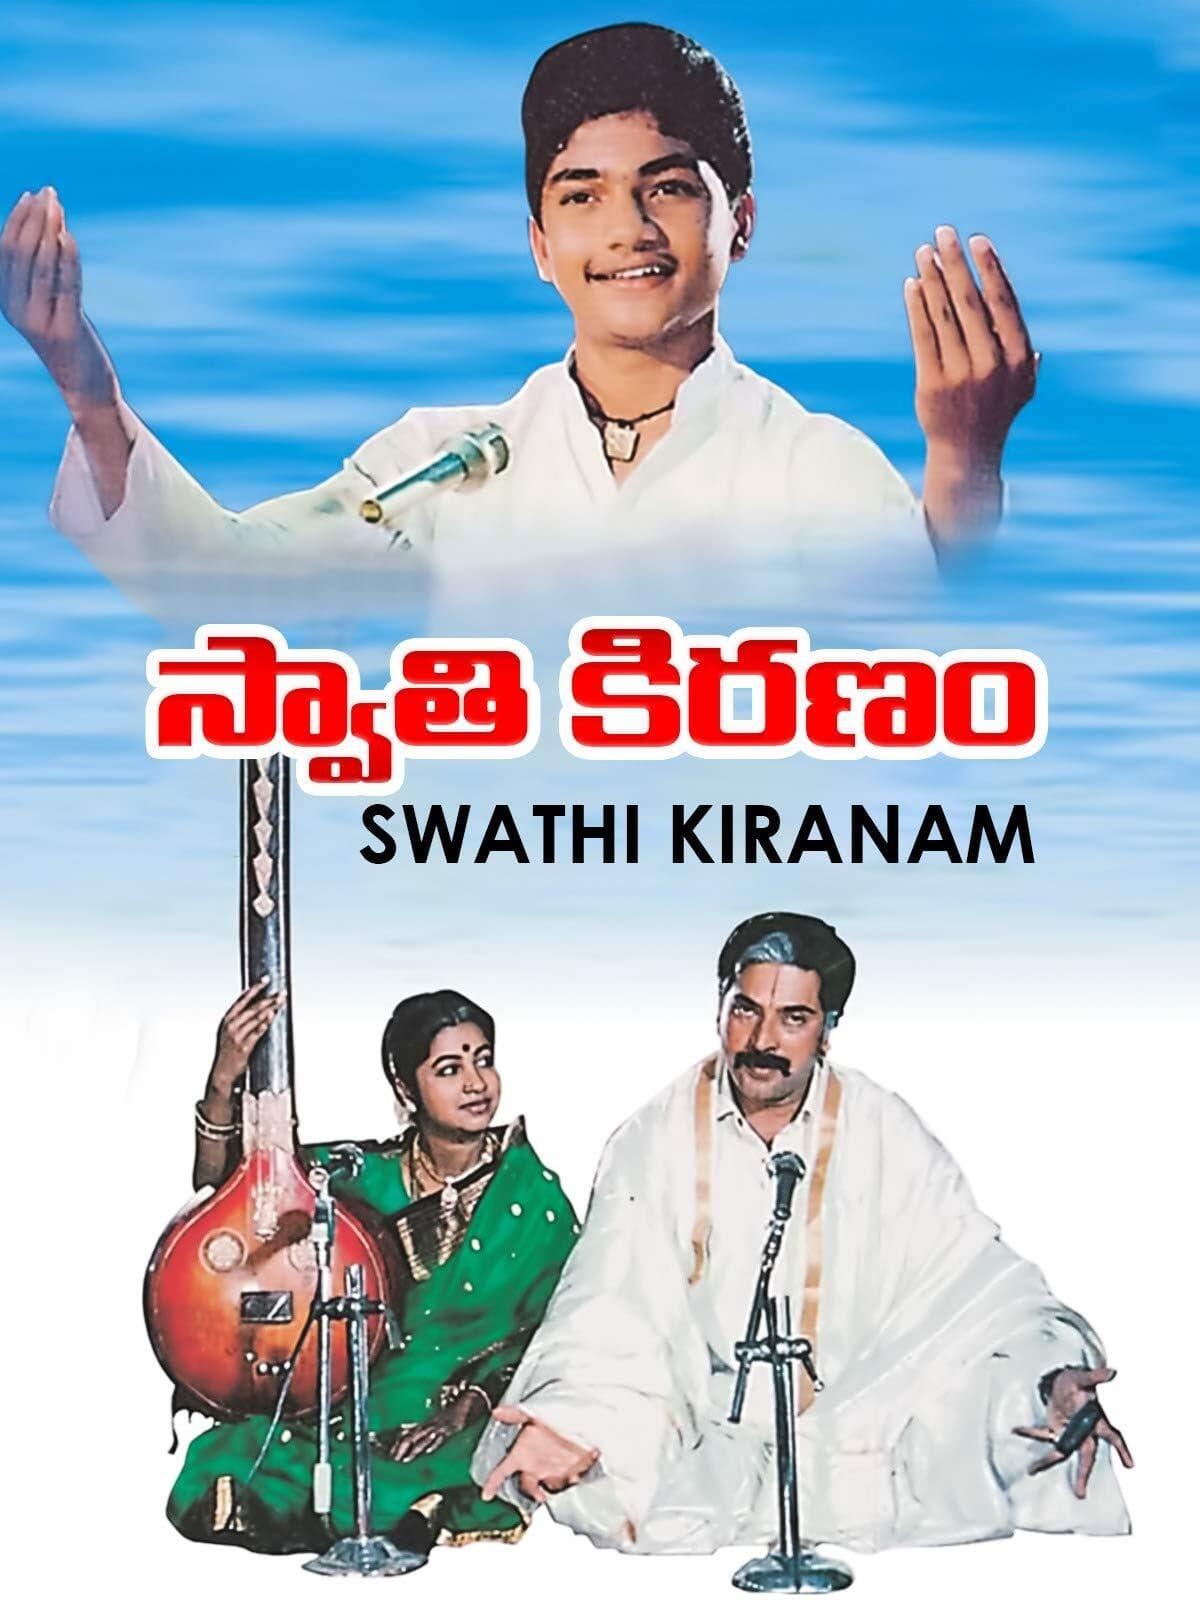 Swati Kiranam